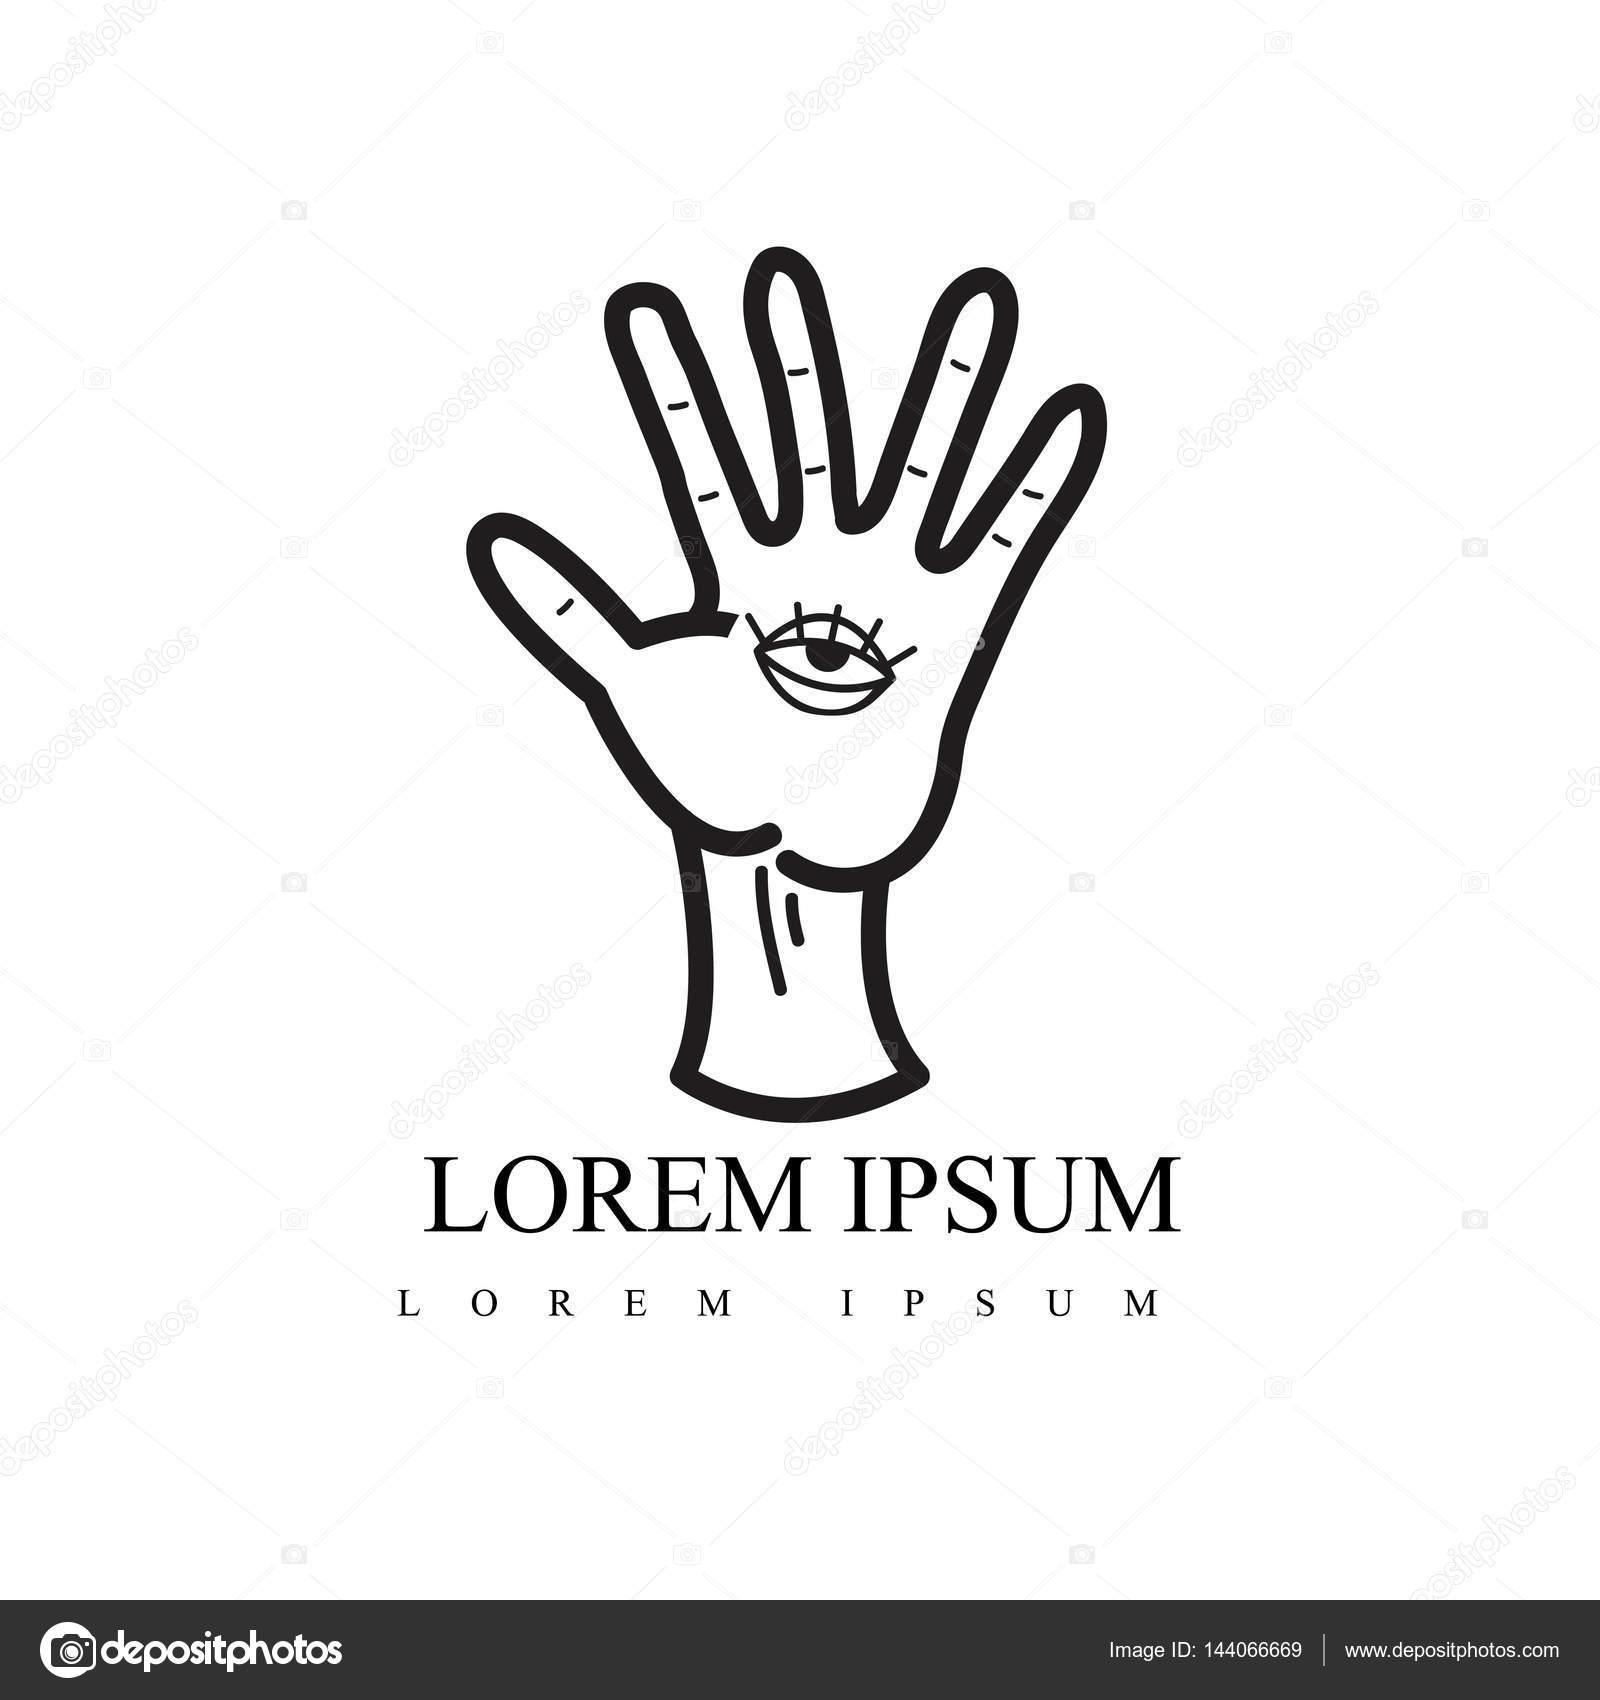 Masonic symbol eye in arm stock vector enotmutant 144066669 masonic symbol eye in arm stock vector buycottarizona Images